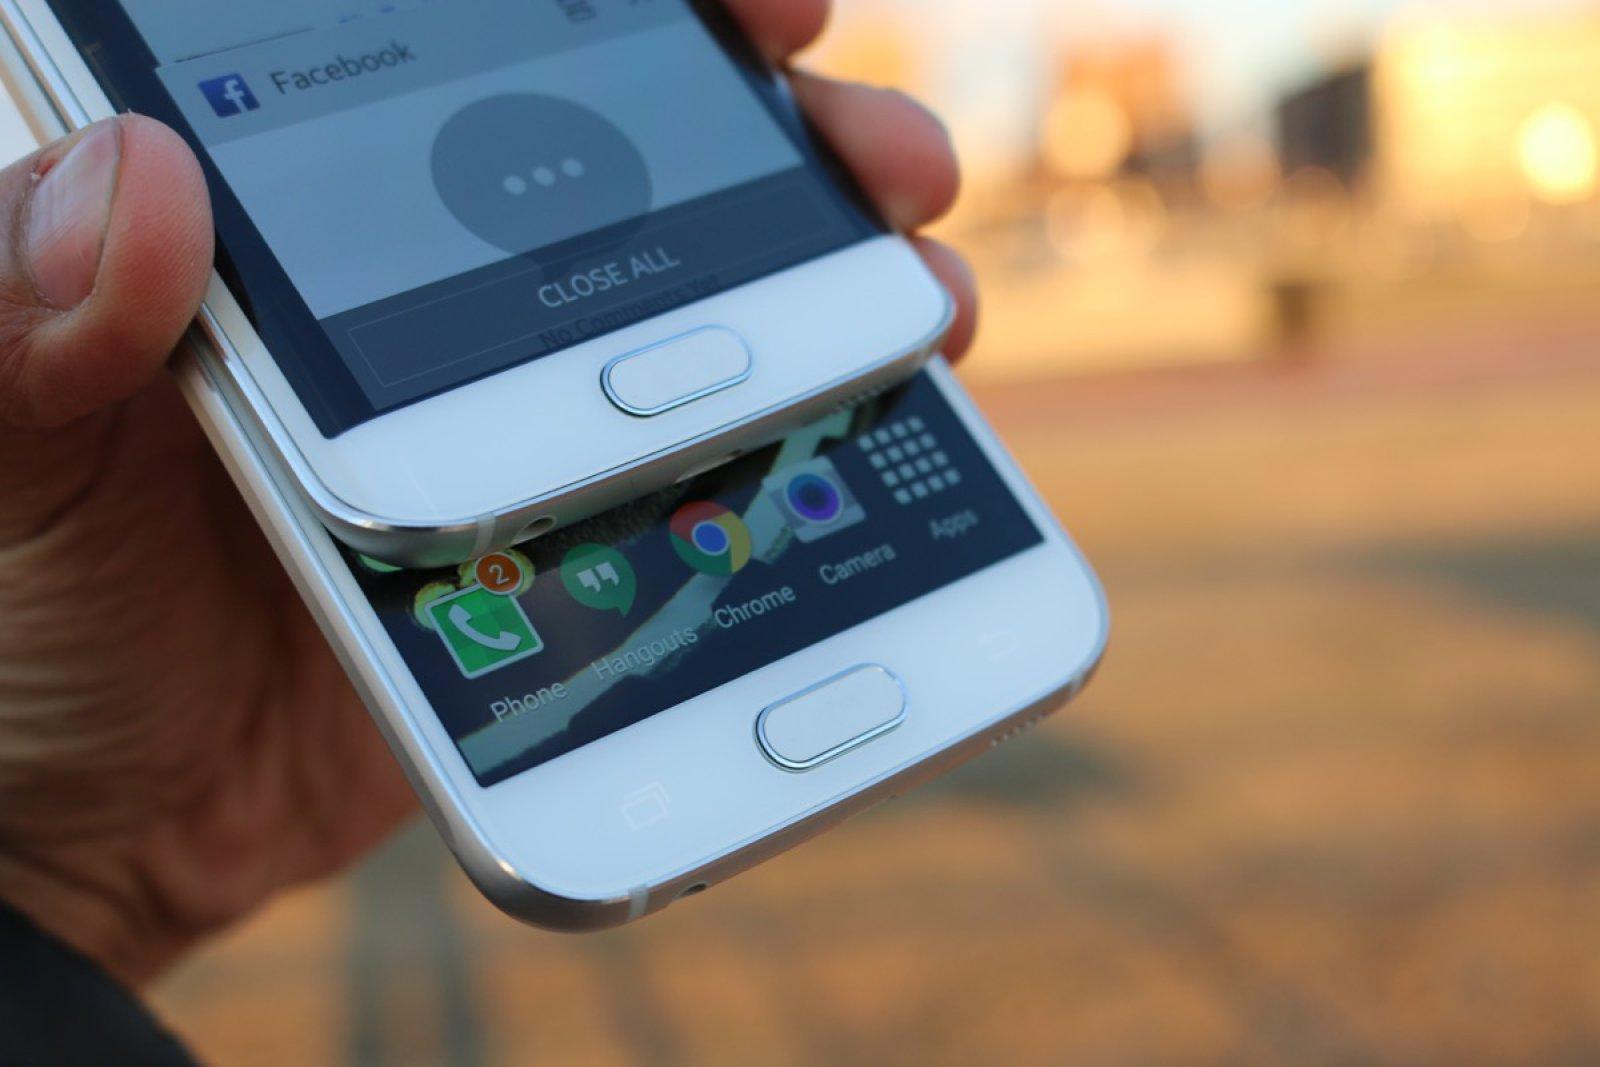 Samsung Smart Inbox